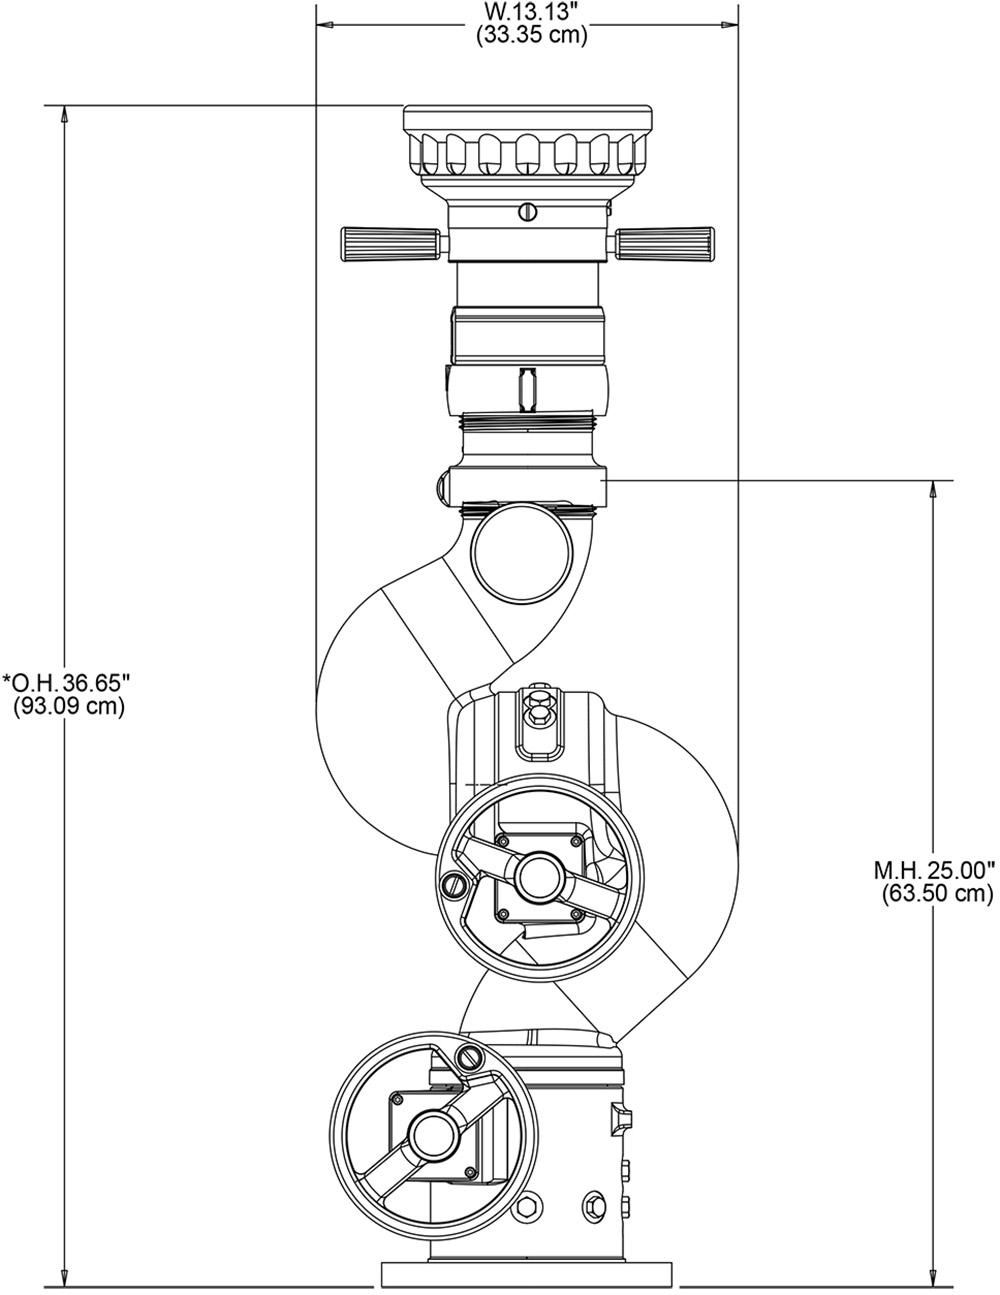 spit fire monitors elkhart brass rh elkhartsales com Fisher Snow Plow Minute Mount Wiring Diagram Xbox 360 Joystick Wireing